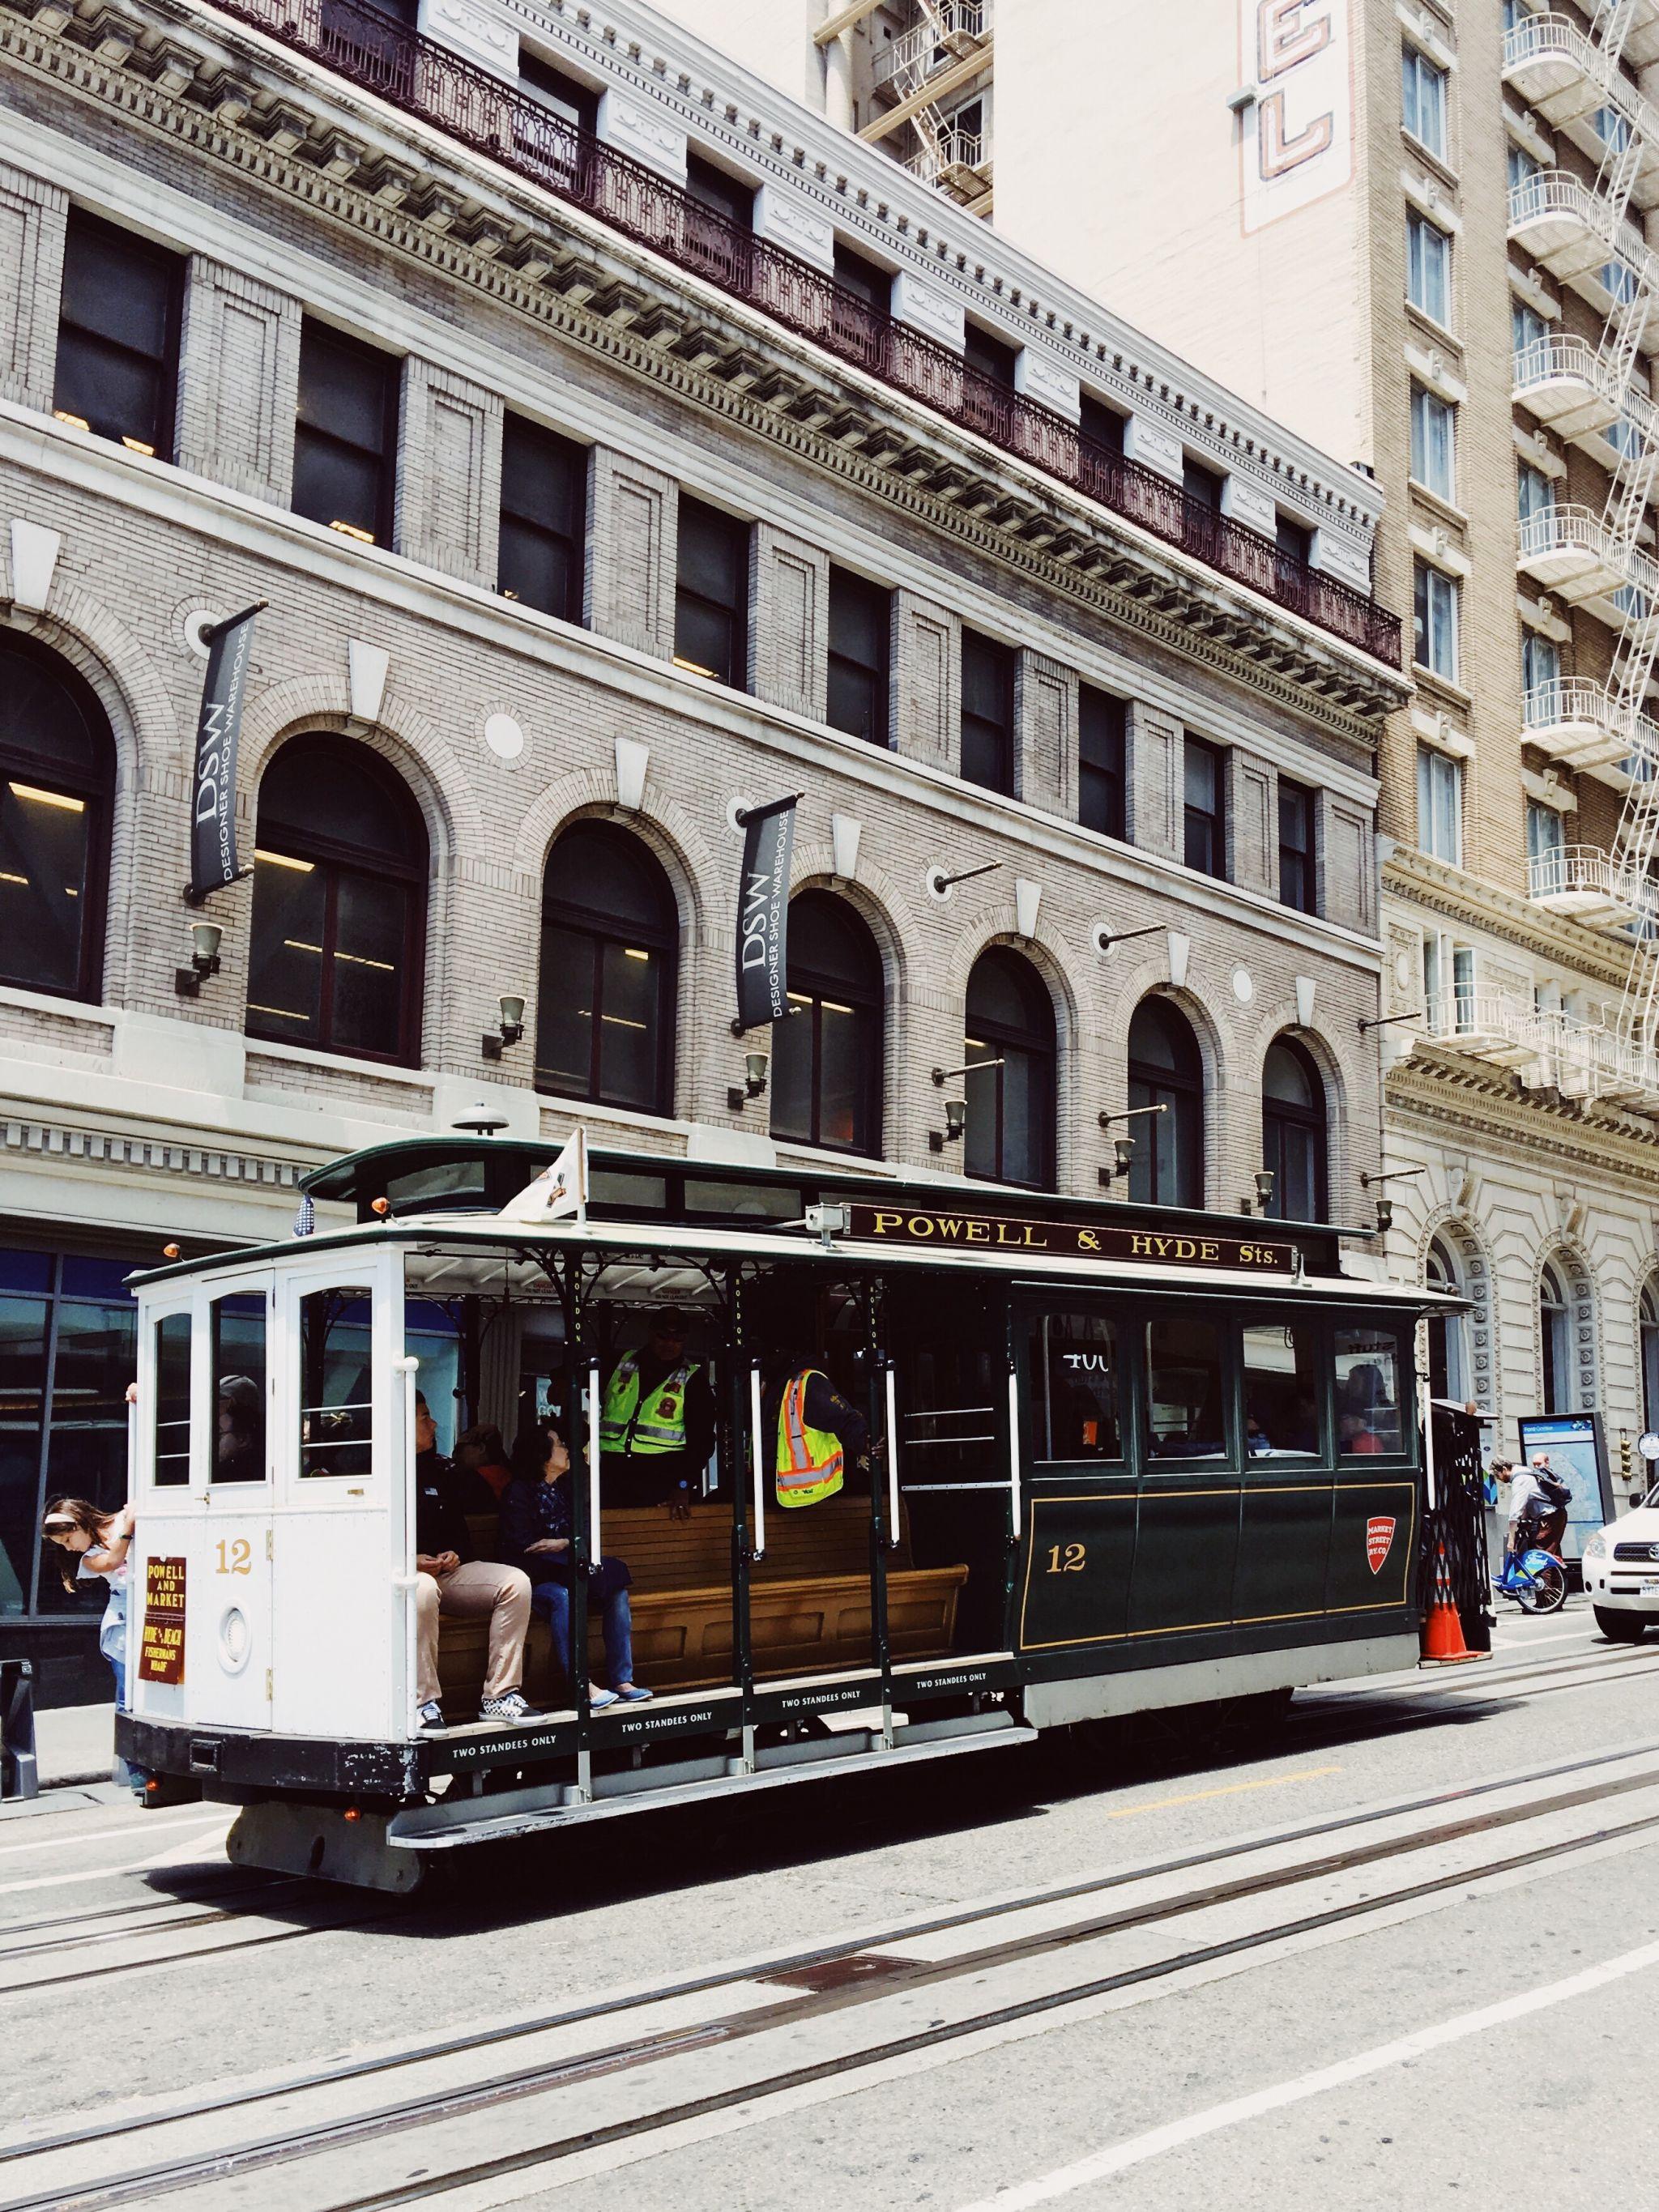 Die Marina/ Chestnut Street Gegend in San Francisco - Nowshine ü40 Reiseblog - Cable Car